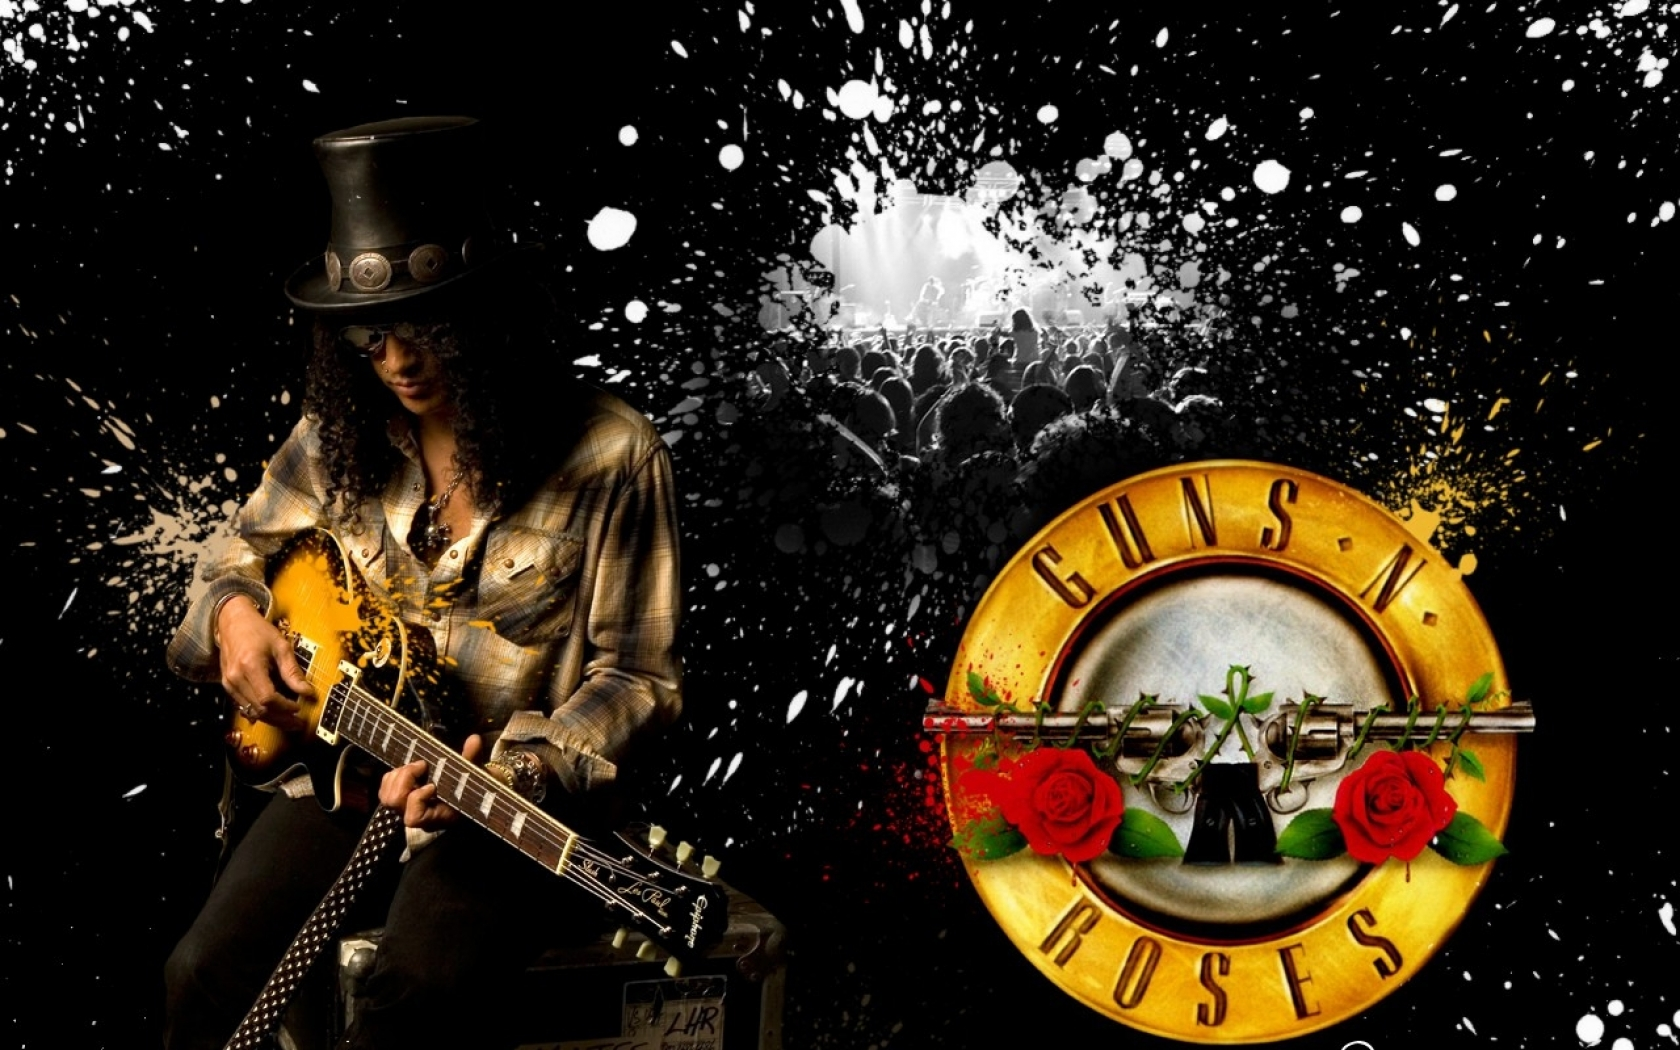 Wallpapers Download 1680x1050 black music guns rock slash rock music 1680x1050